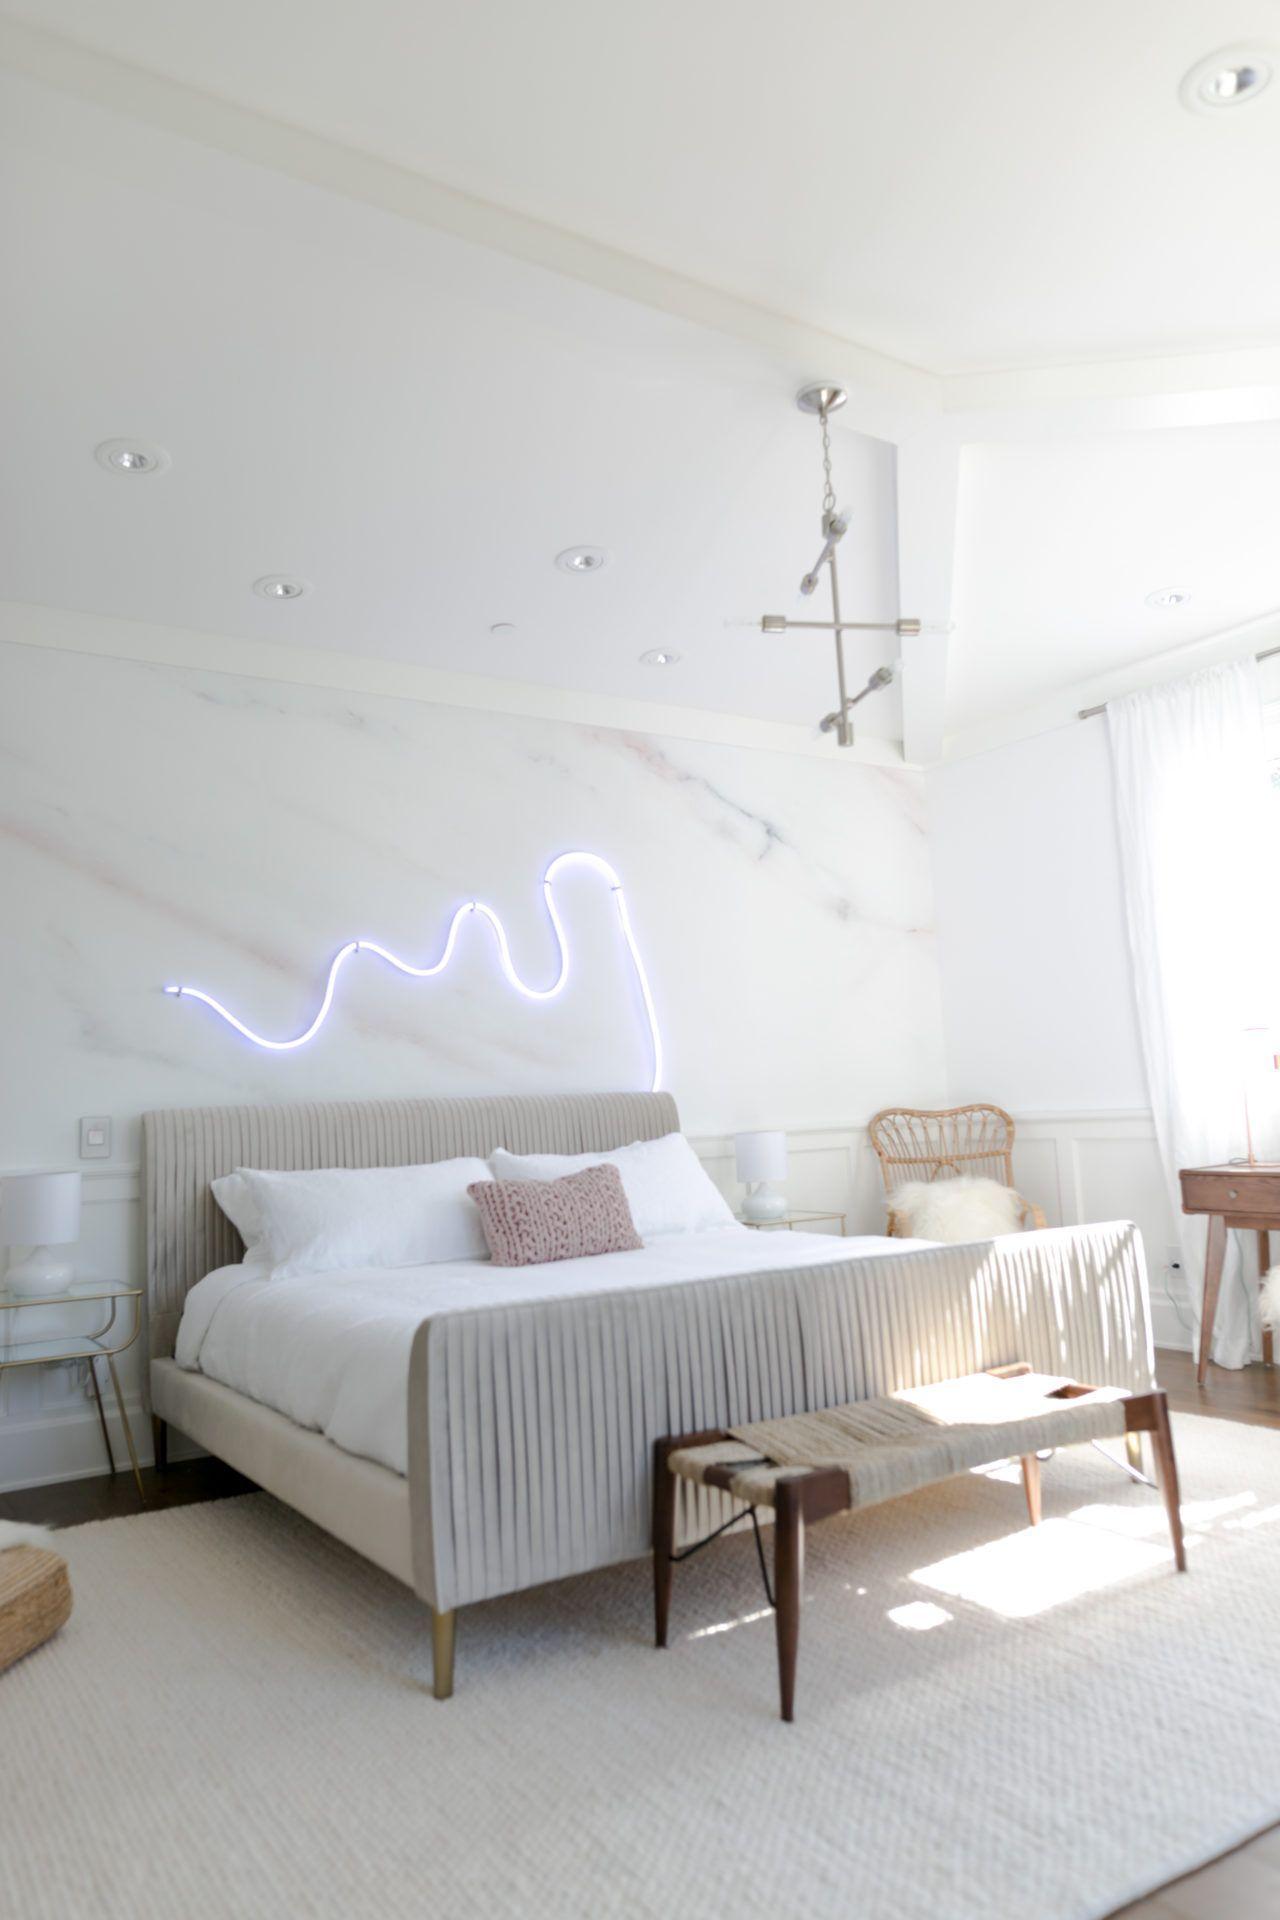 Outstanding 24 Best Palm Springs Bedroom Httpsfancydecorsco2018